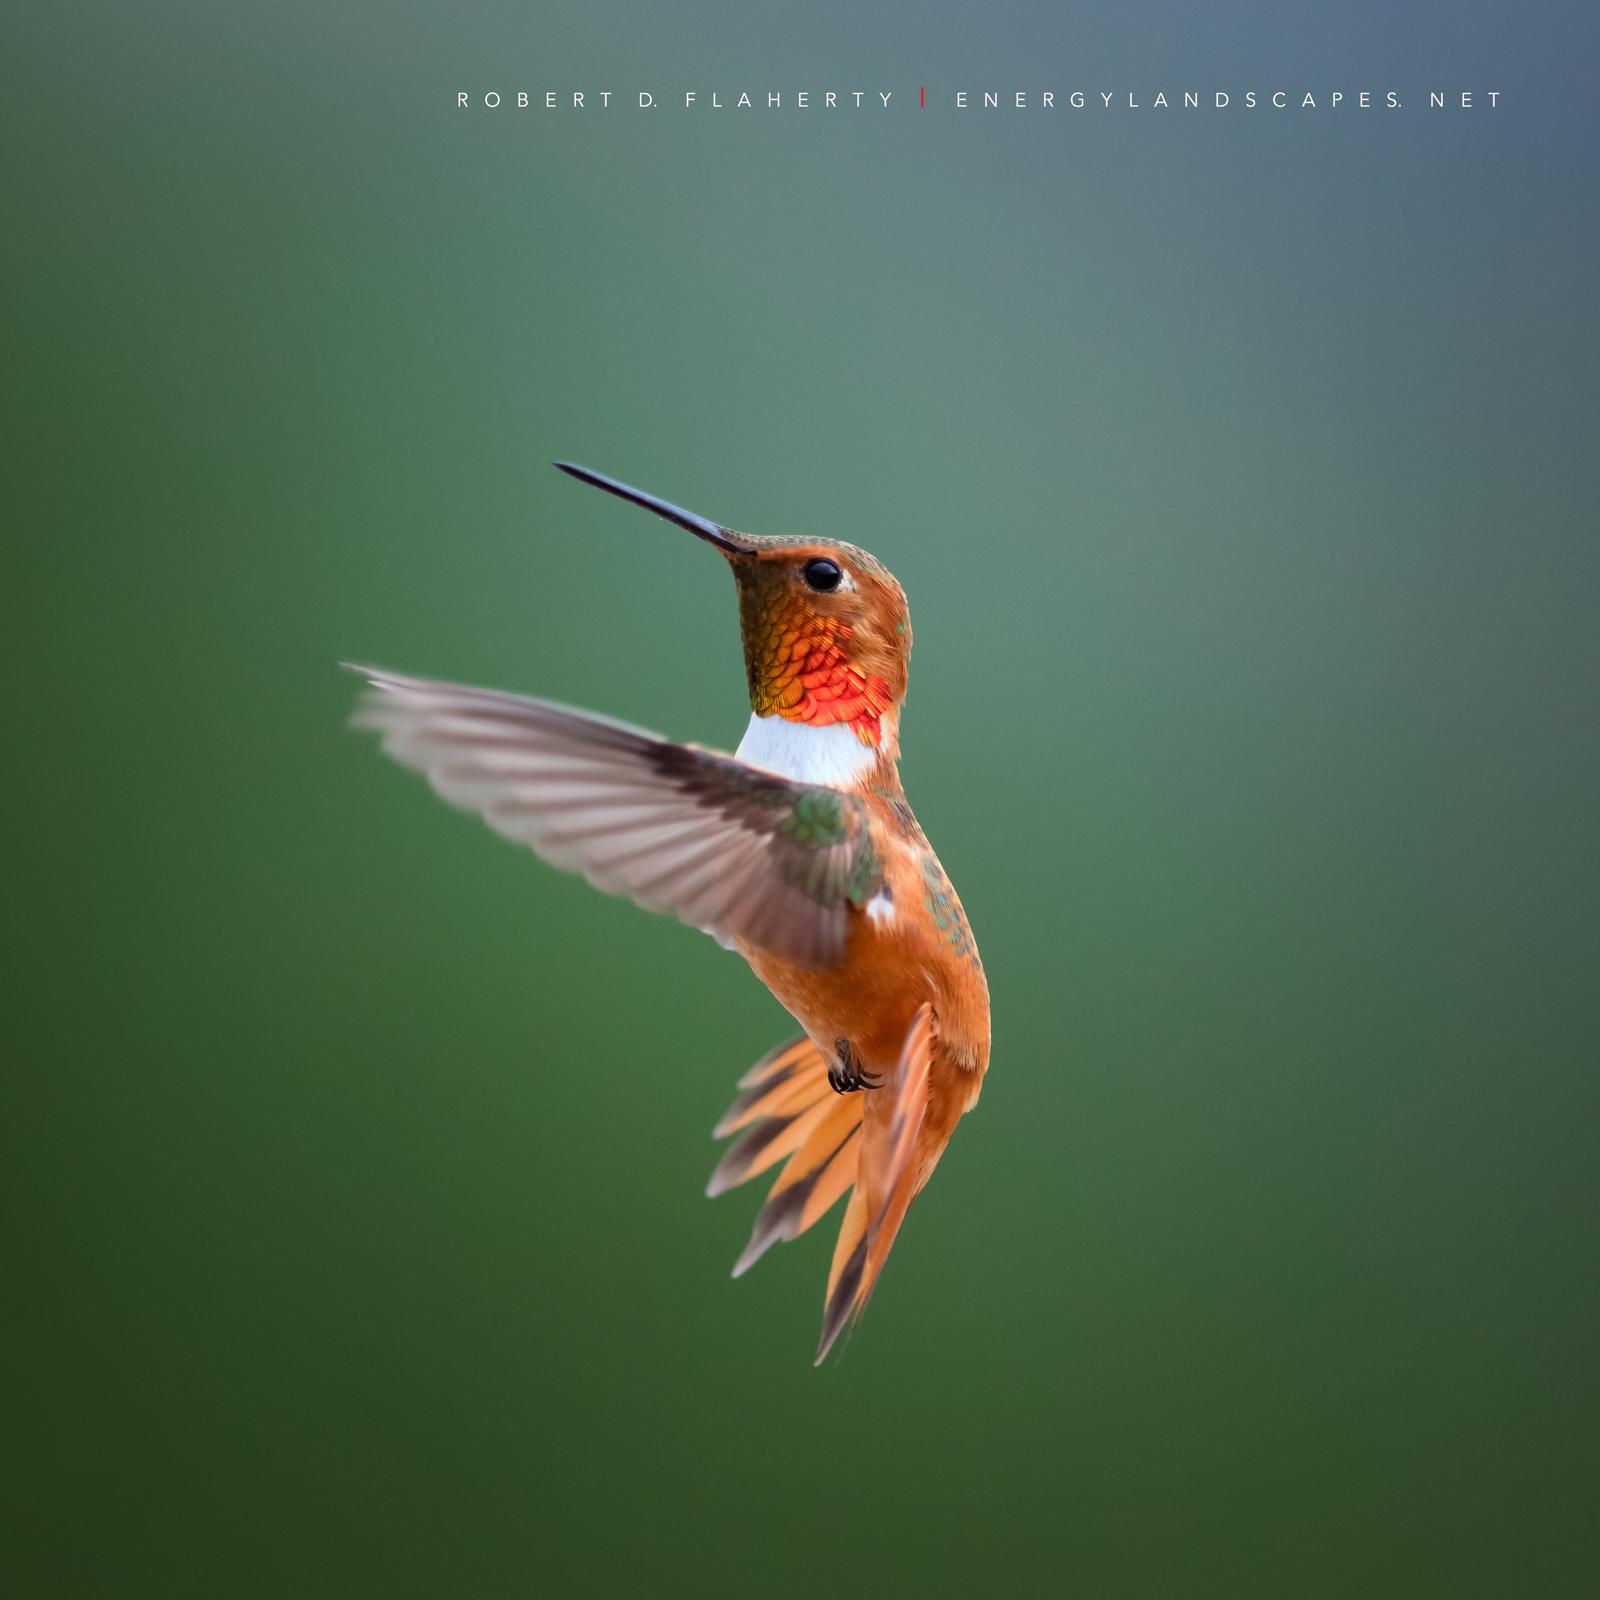 Rufous In Detail  hummingbird, hummingbirds, fine art photography, New Mexico, South Central Mountains, monsoon, Ruidoso, Ruidoso New Mexico, rain, fine art, photo